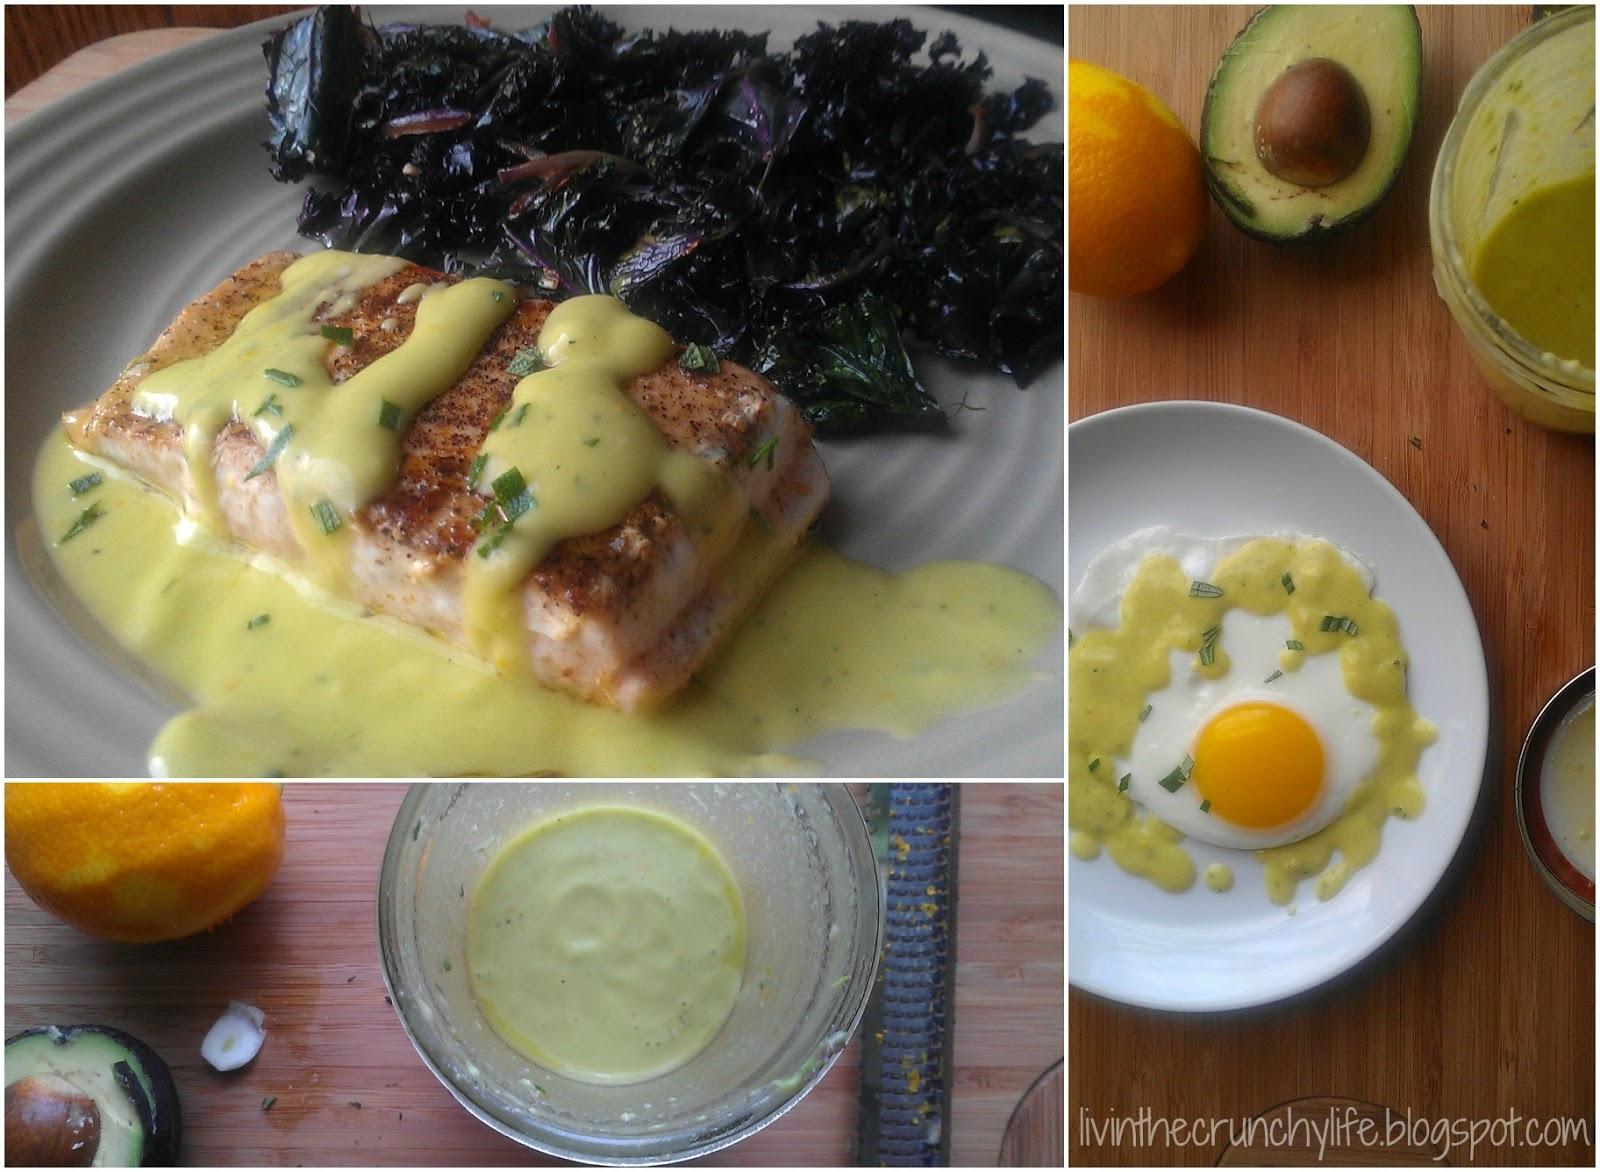 Pan-fried Salmon with a Creamy Meyer Lemon Vinaigrette (egg/dairy-free)